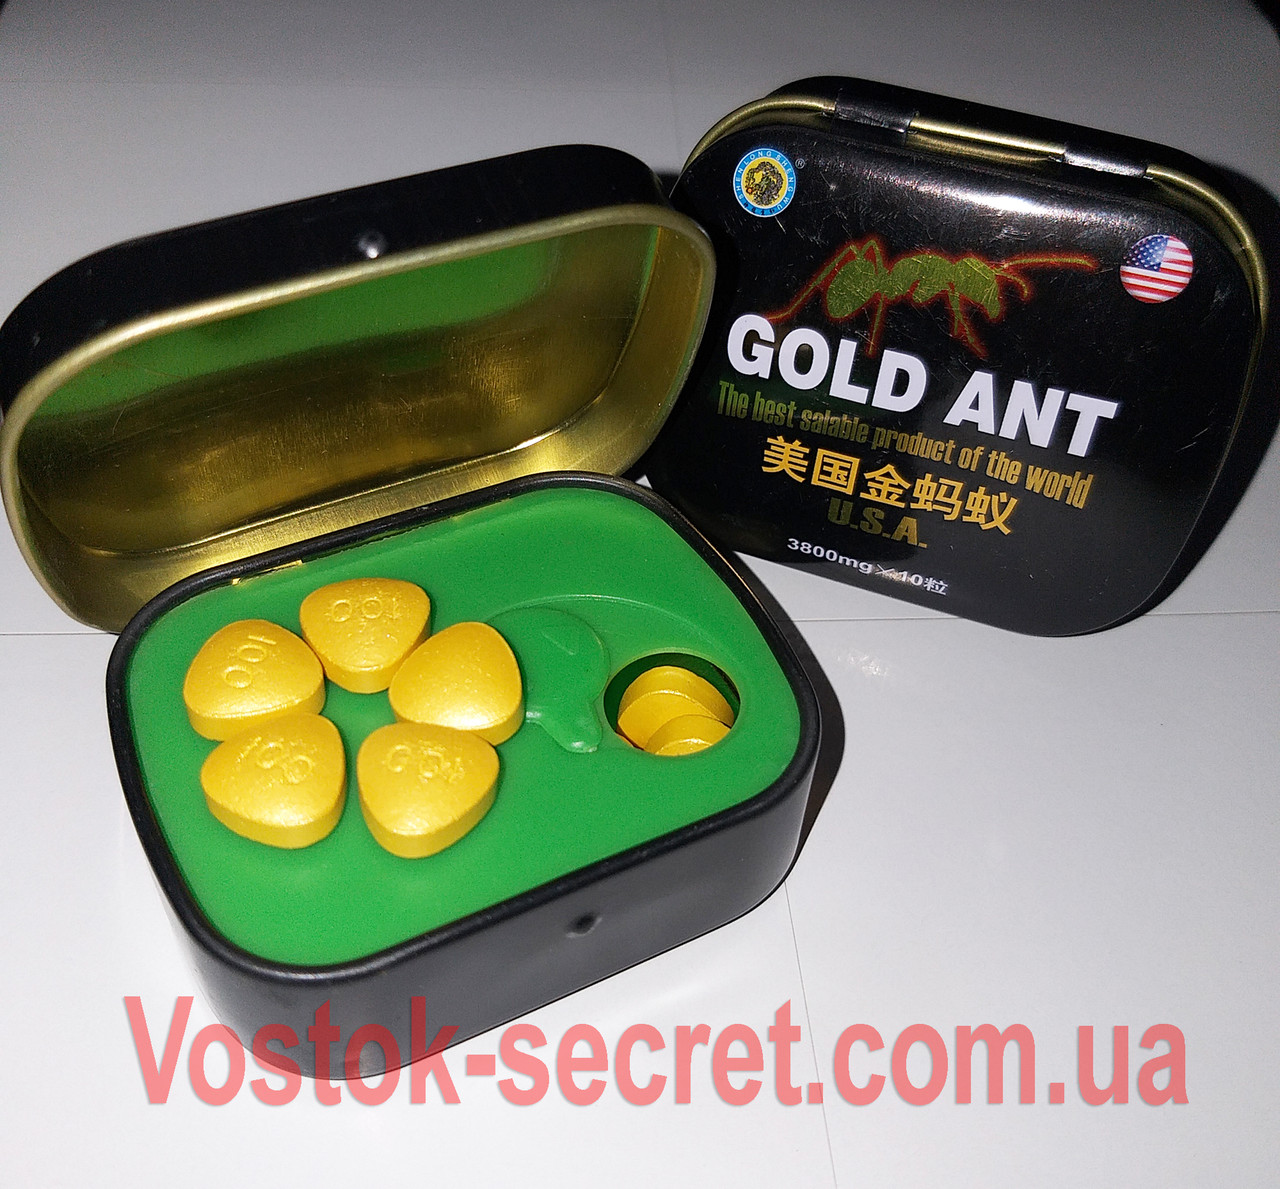 Золотой Муравей - Gold Ant - Препарат для потенции, 10табл*3800мг. (Голд ант)